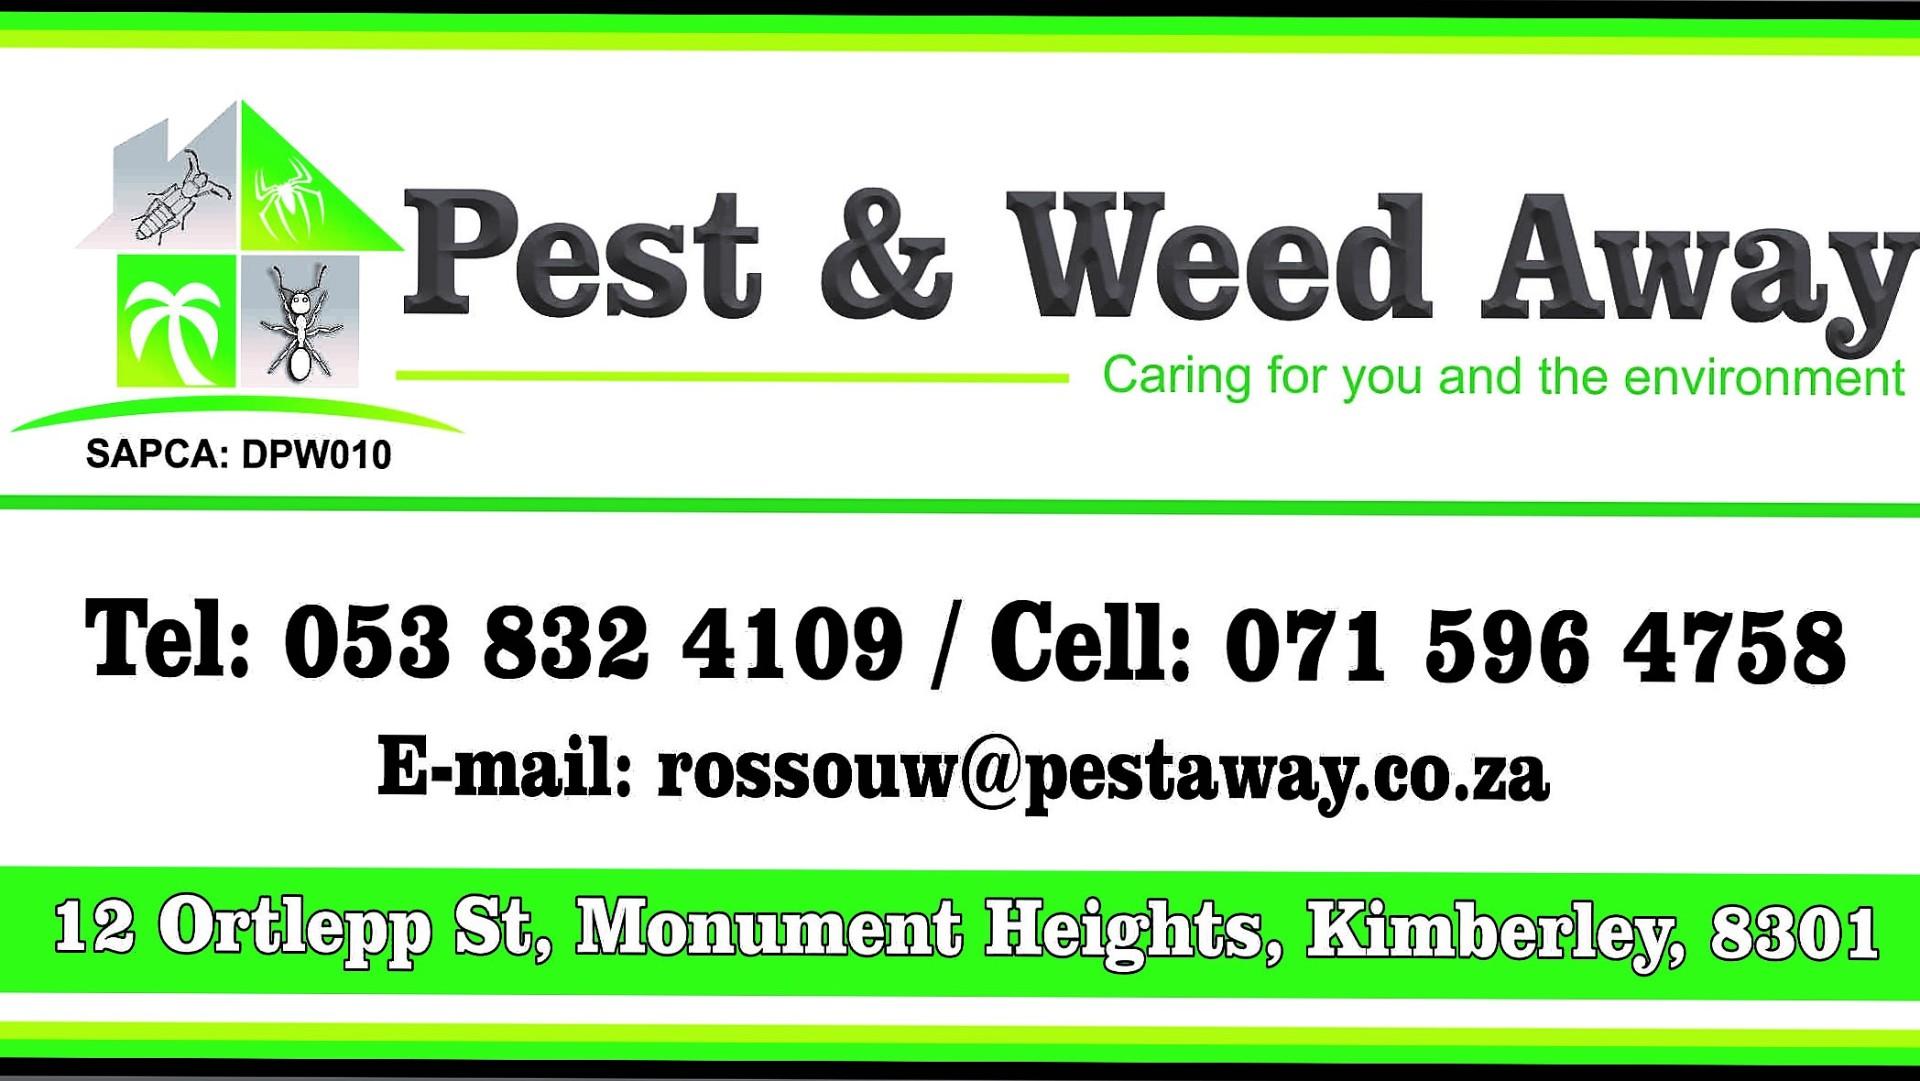 PEST WEED AWAY CAR ADVERT